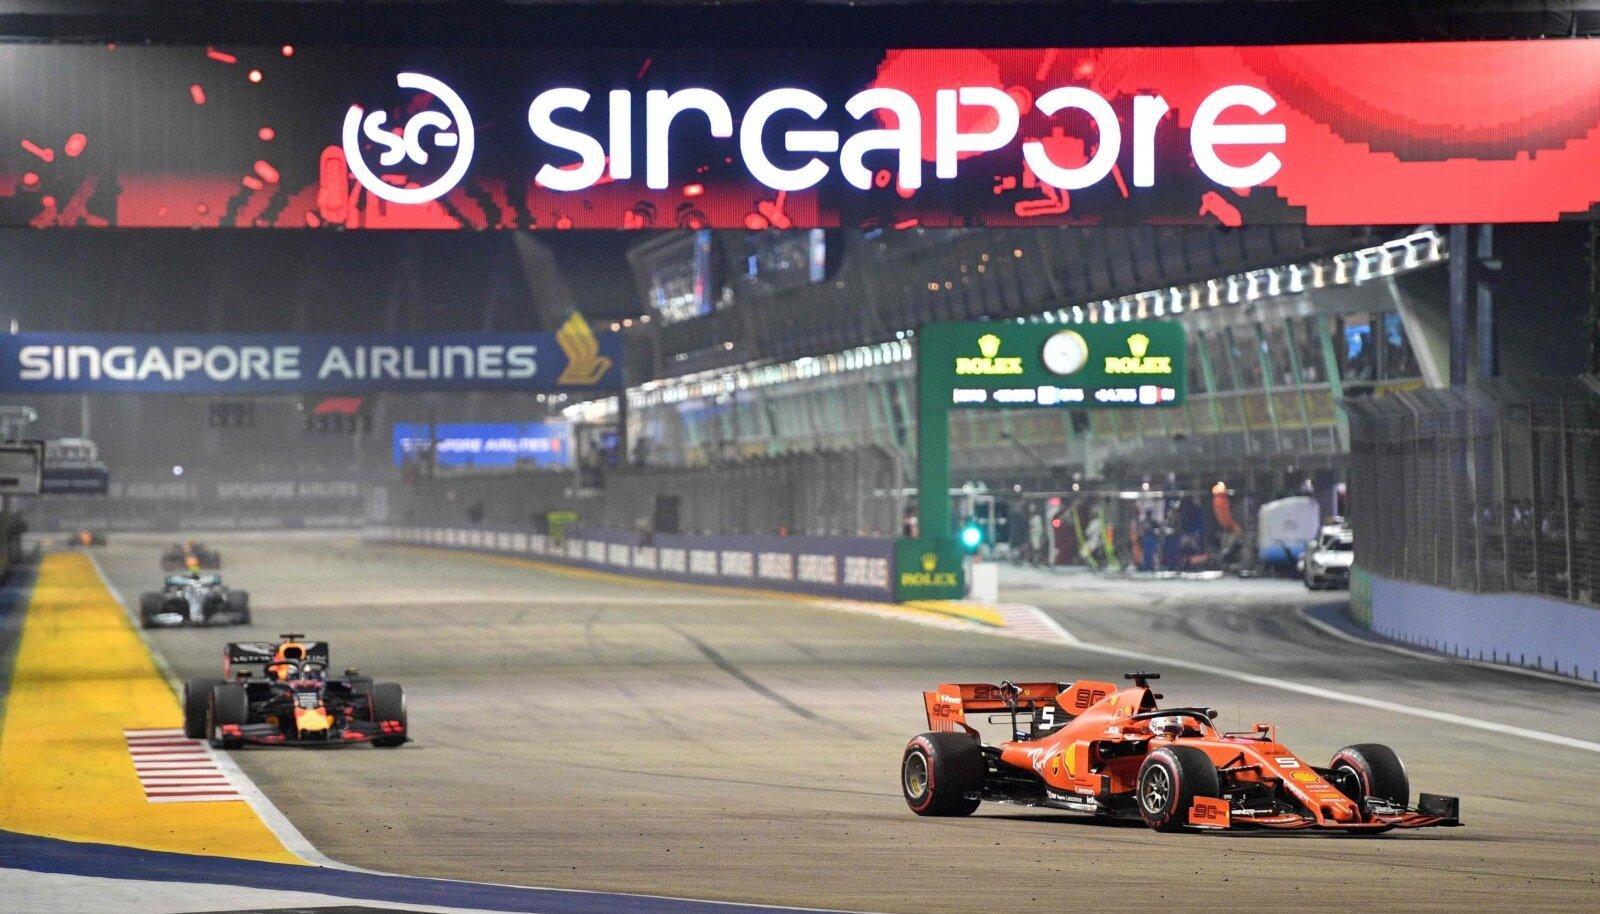 Singapuri vormel-1 etapp.